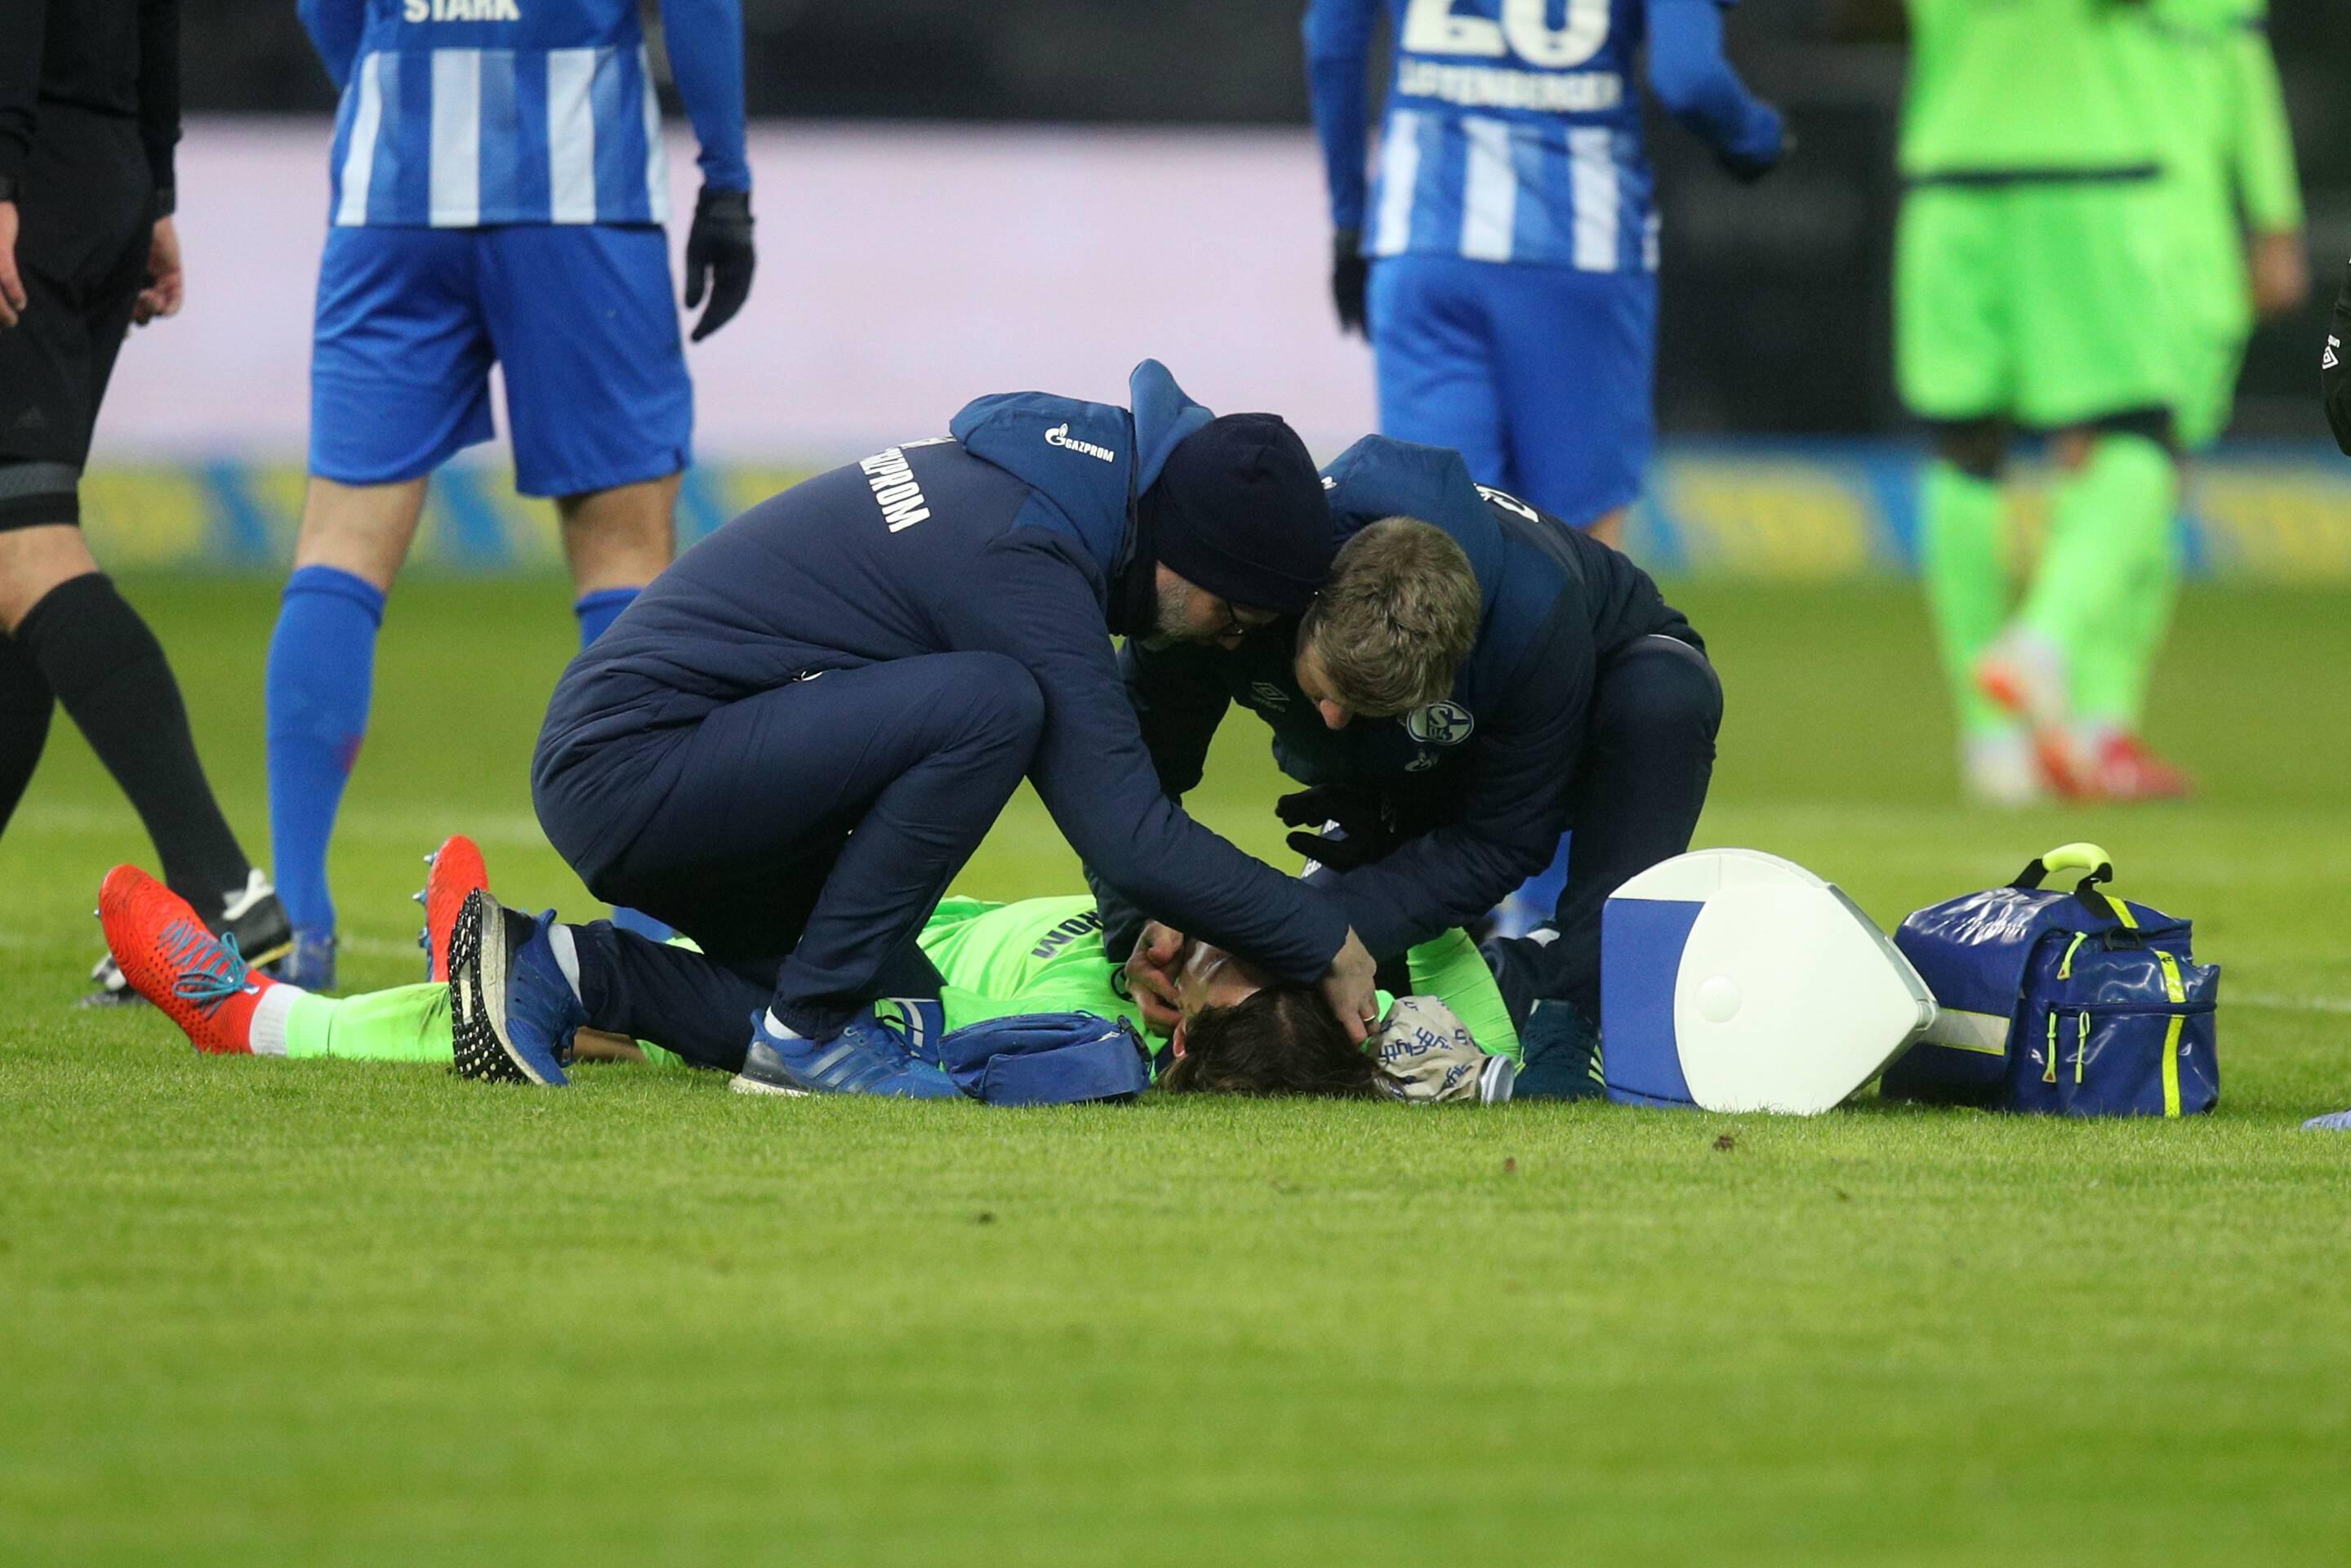 Bild zu Fußball, Bundesliga, Hertha, Schalke, S04